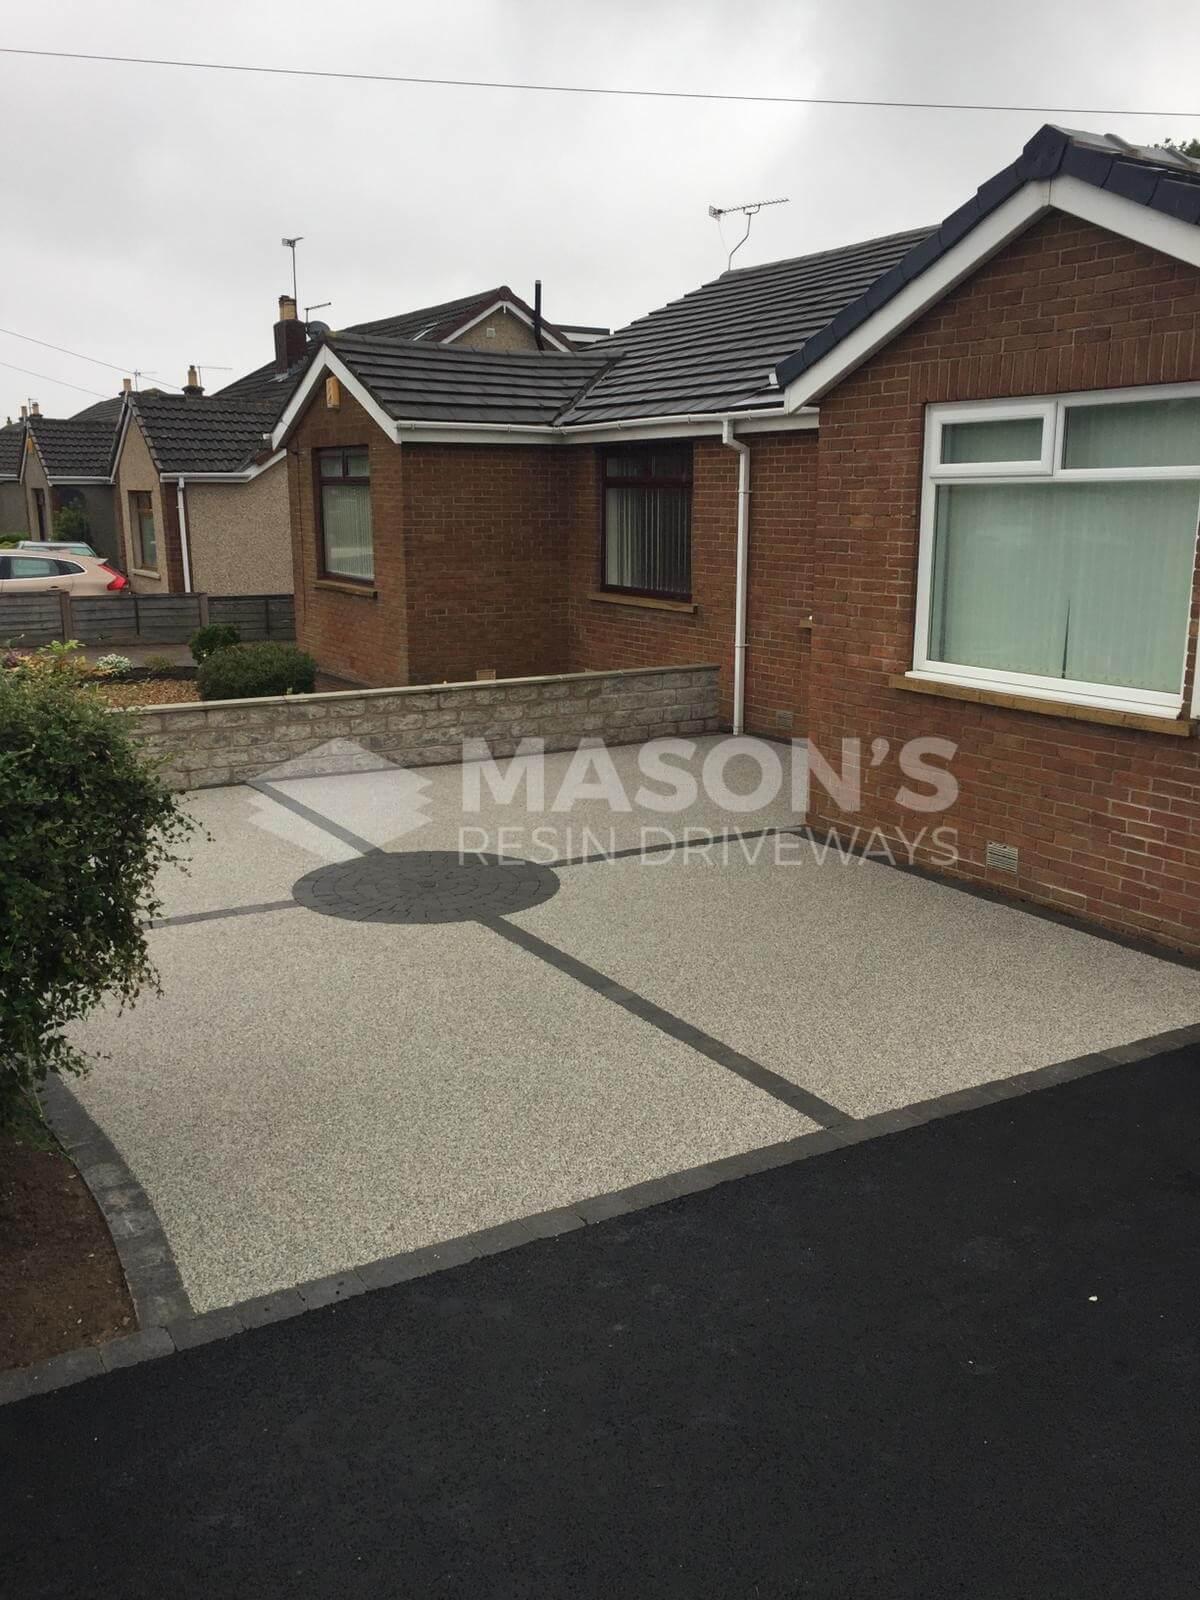 Silver quartz Resin Bound Driveway on house in Preston, Lancashire